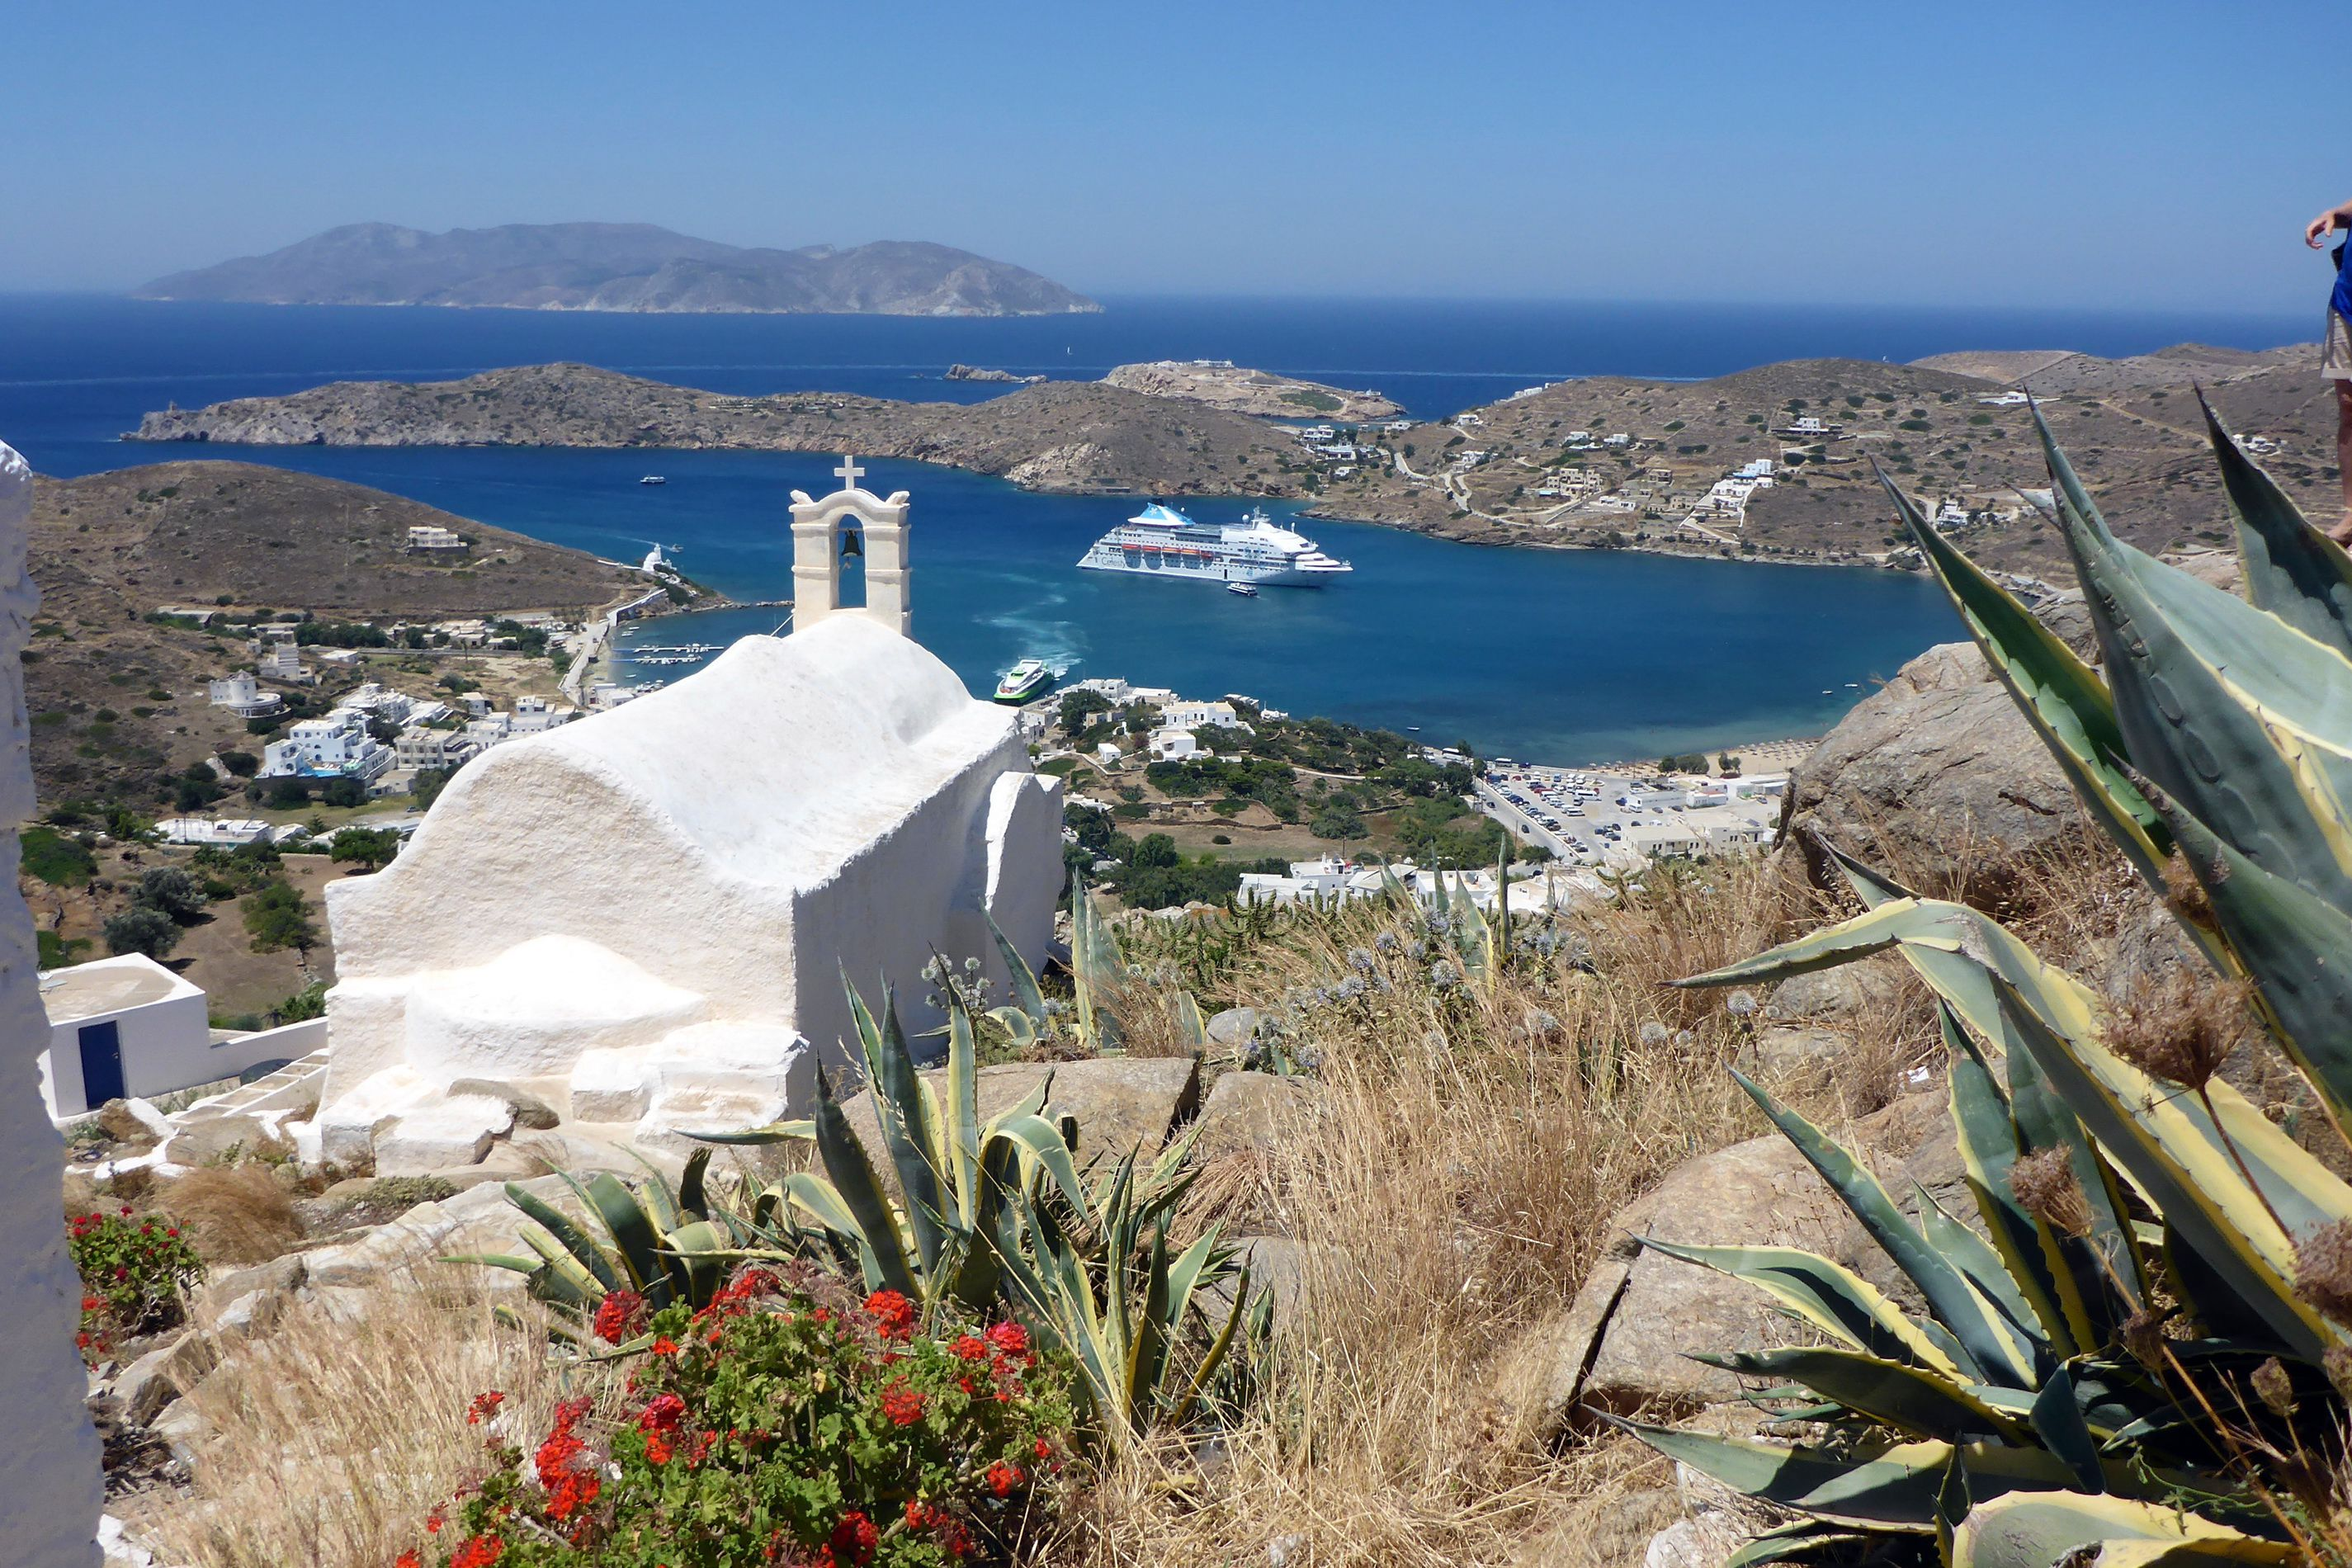 Harbor view on Greek island of Ios